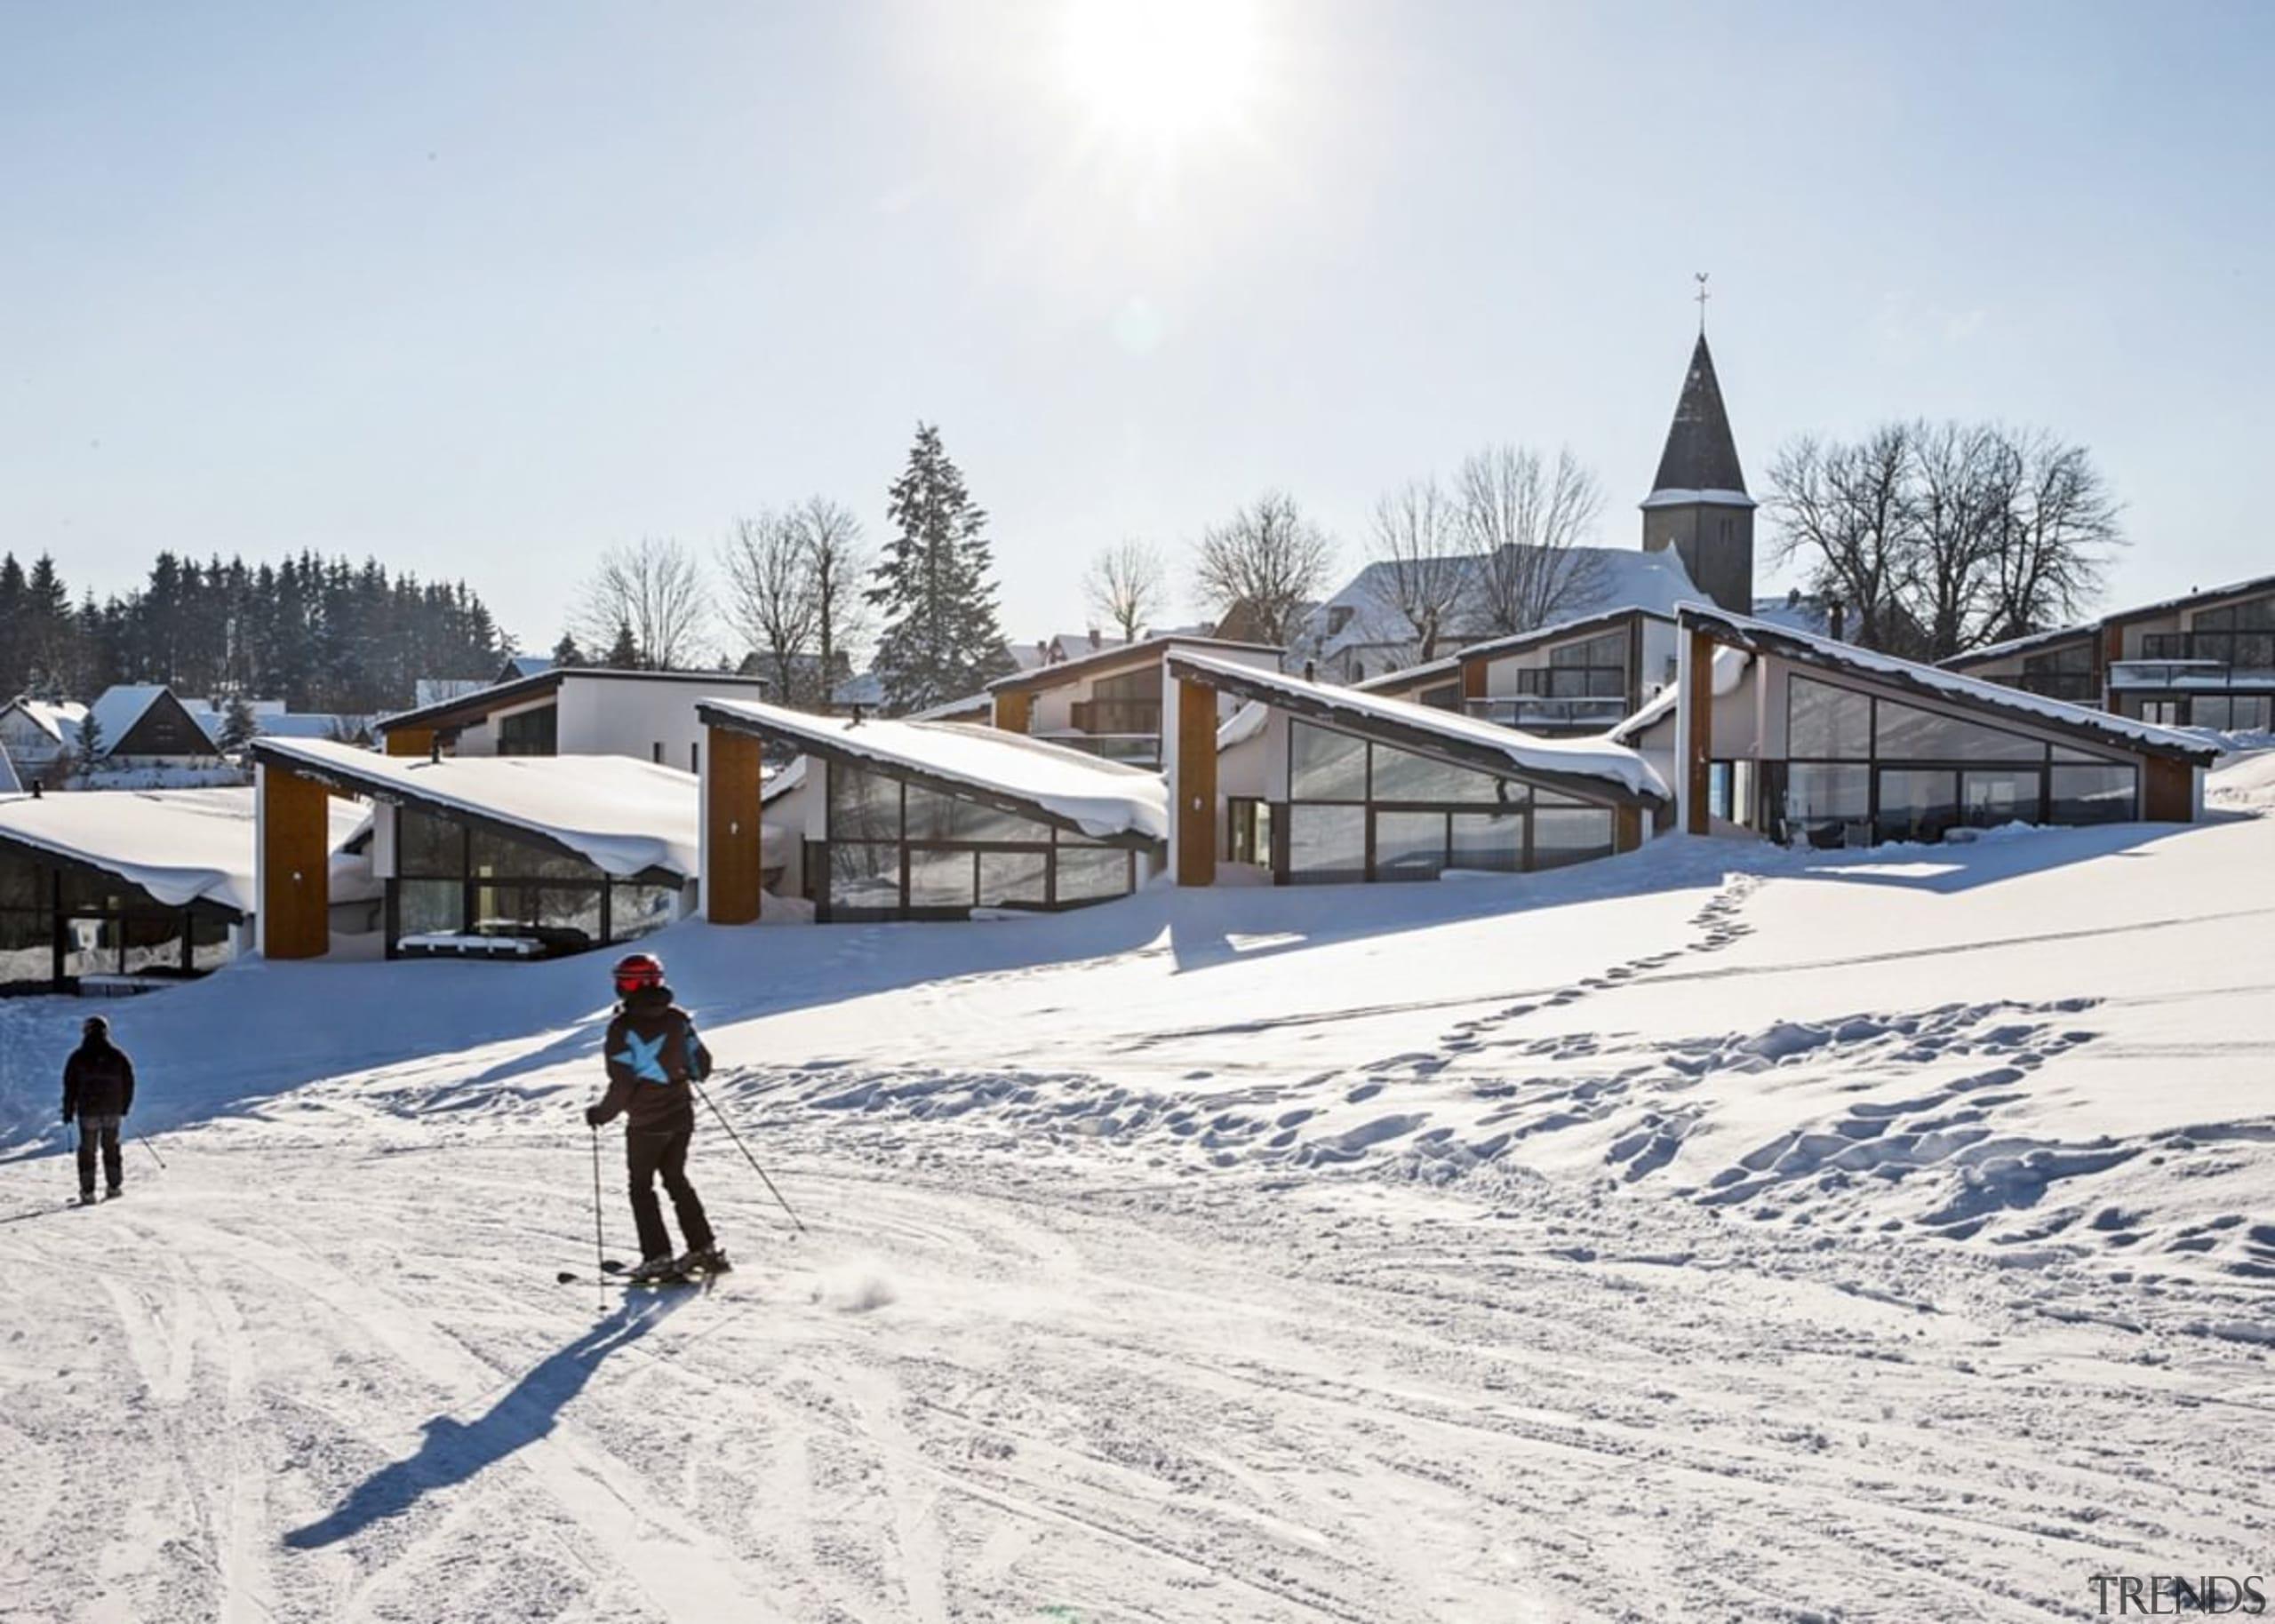 Skiing past the villas - Skiing past the cross country skiing, mountain range, nordic skiing, piste, recreation, roof, ski, ski cross, ski equipment, skiing, sky, snow, winter, winter sport, white